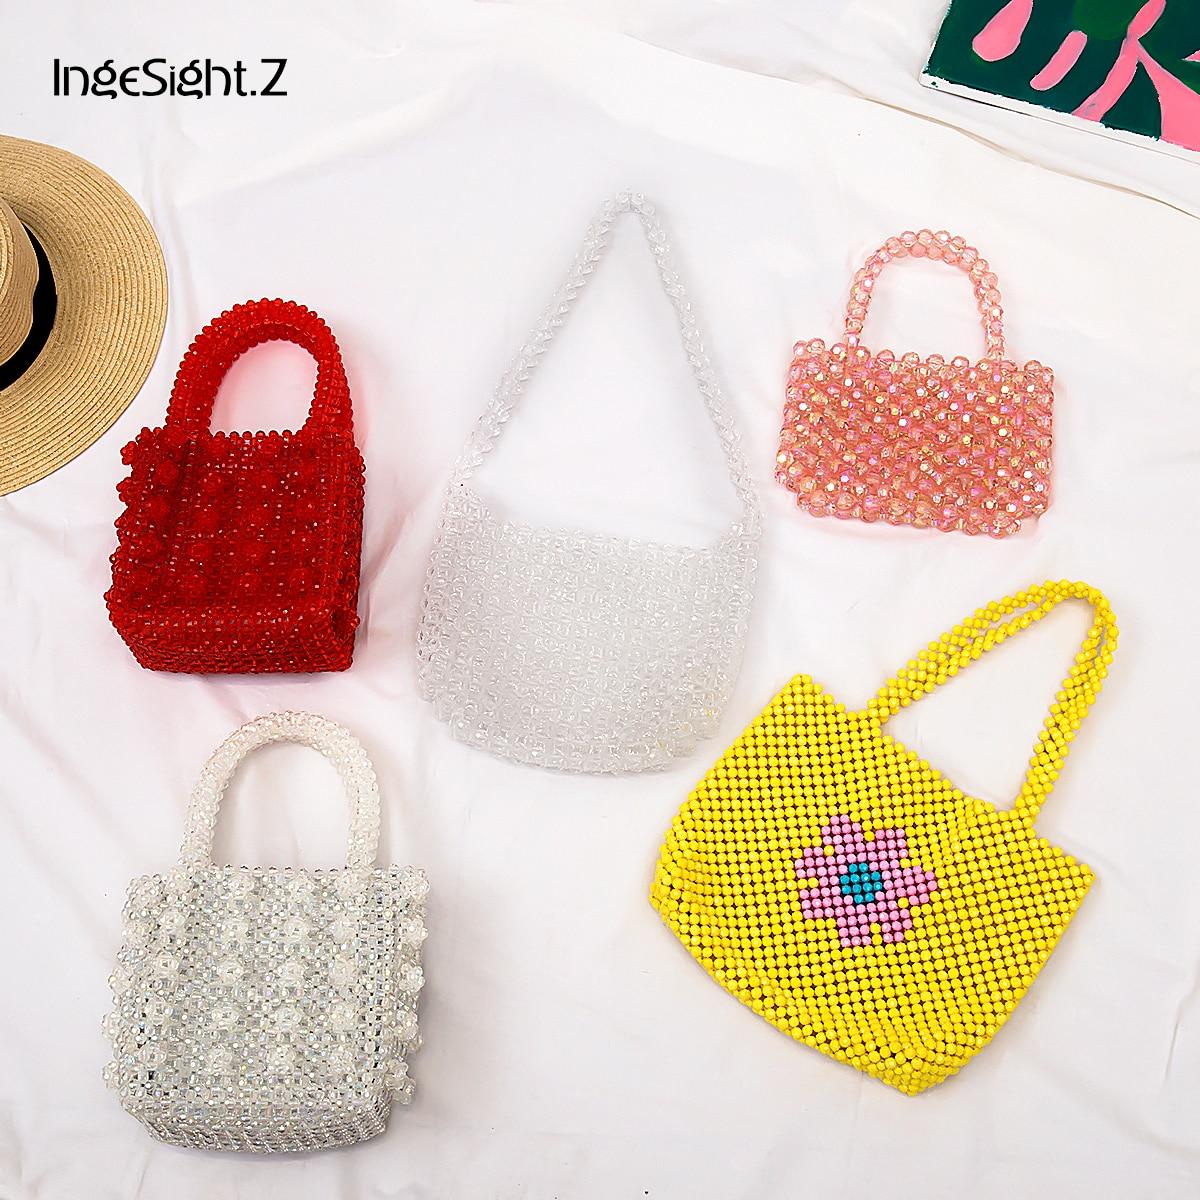 IngeSight.Z Luxury Handmade Pearl Bags Elegant Acrylic Beaded Handbags Mini Cross Body Bags For Women Female Wedding Jewelry